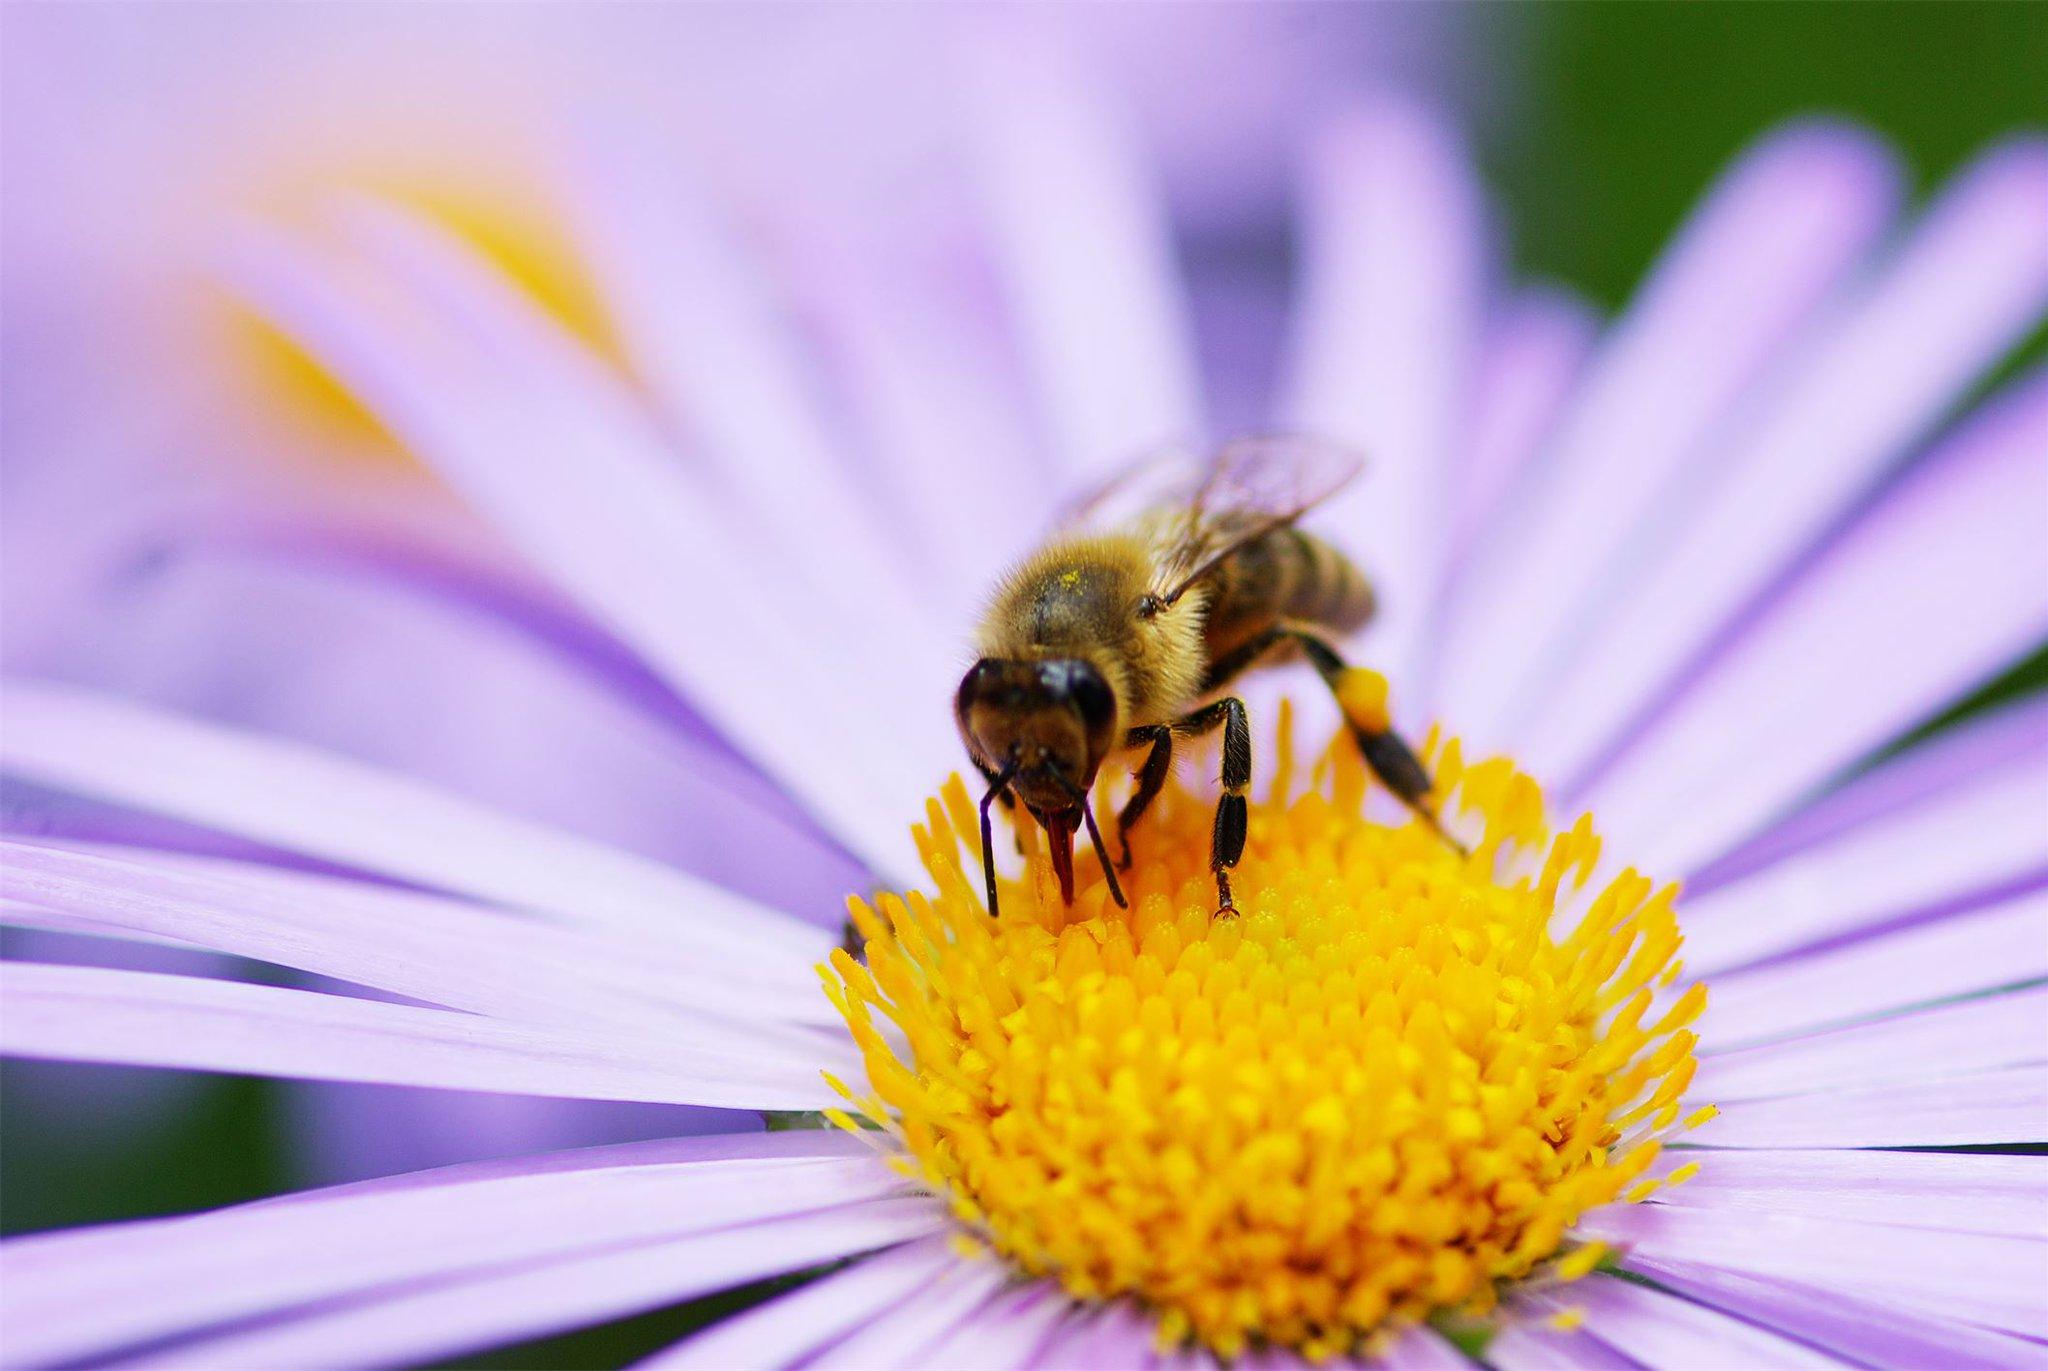 картинки пчела на цветочке другу приставкой